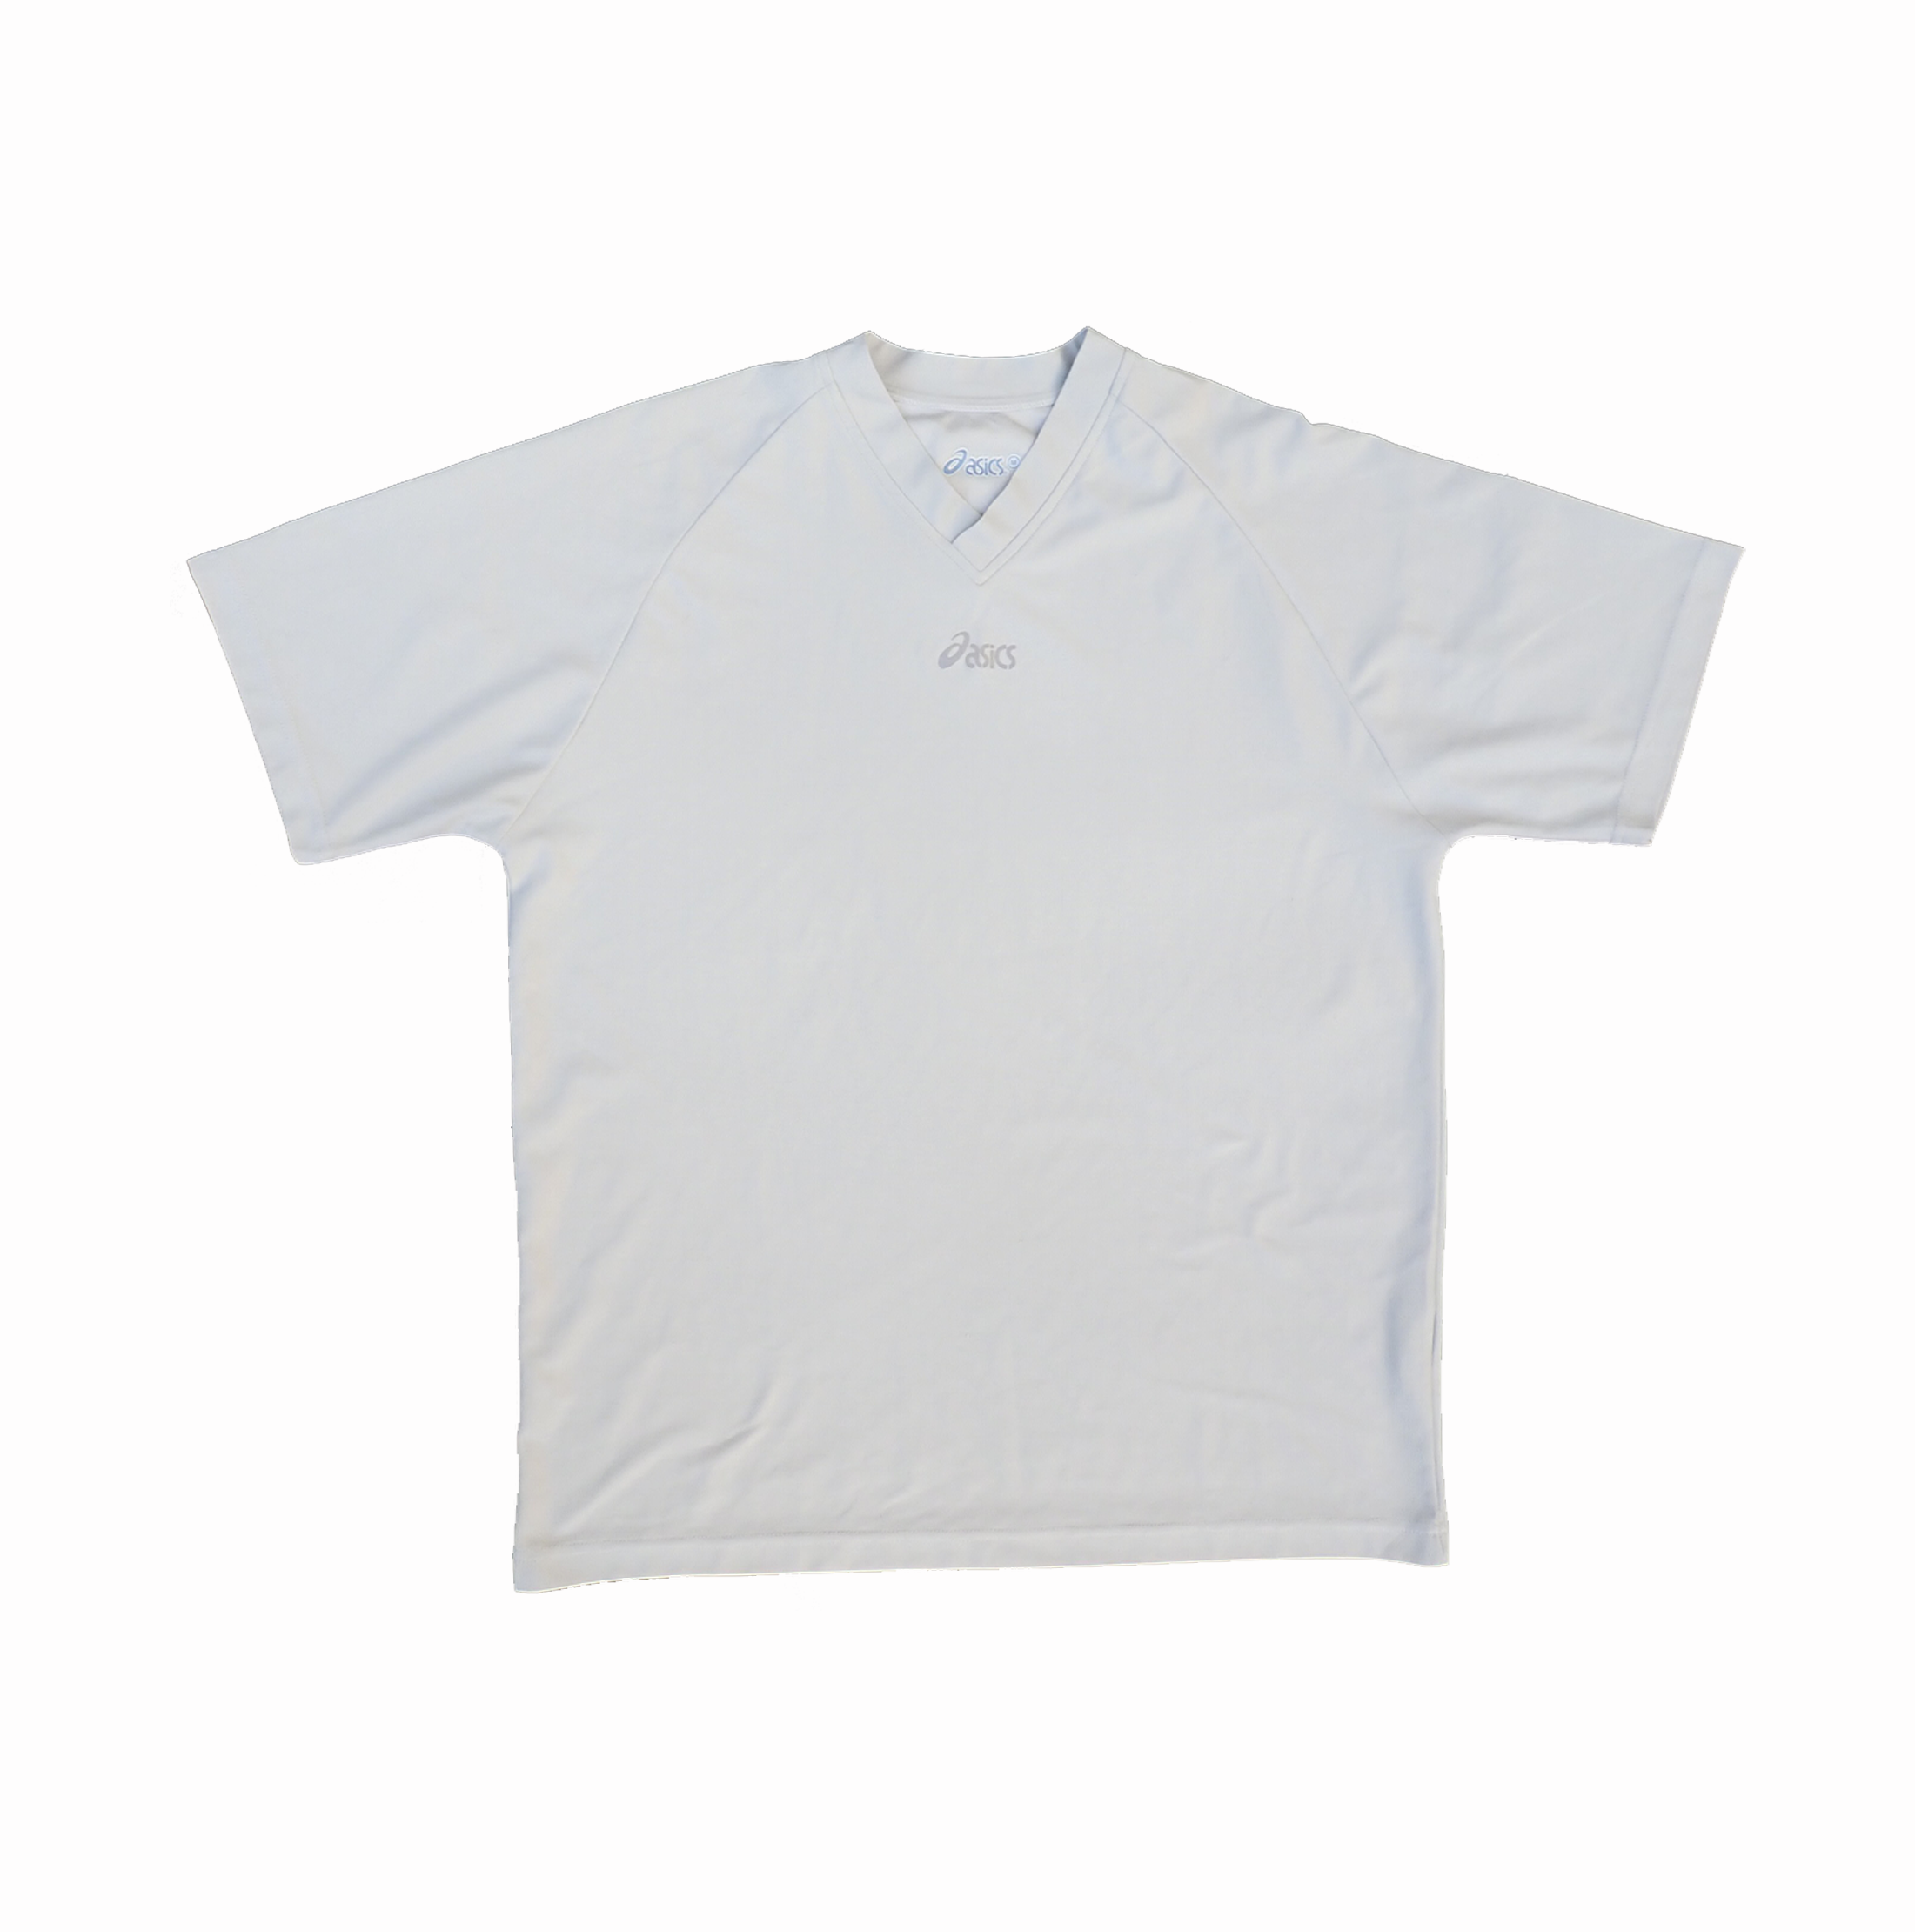 Asics Reflective Vneck Tshirt